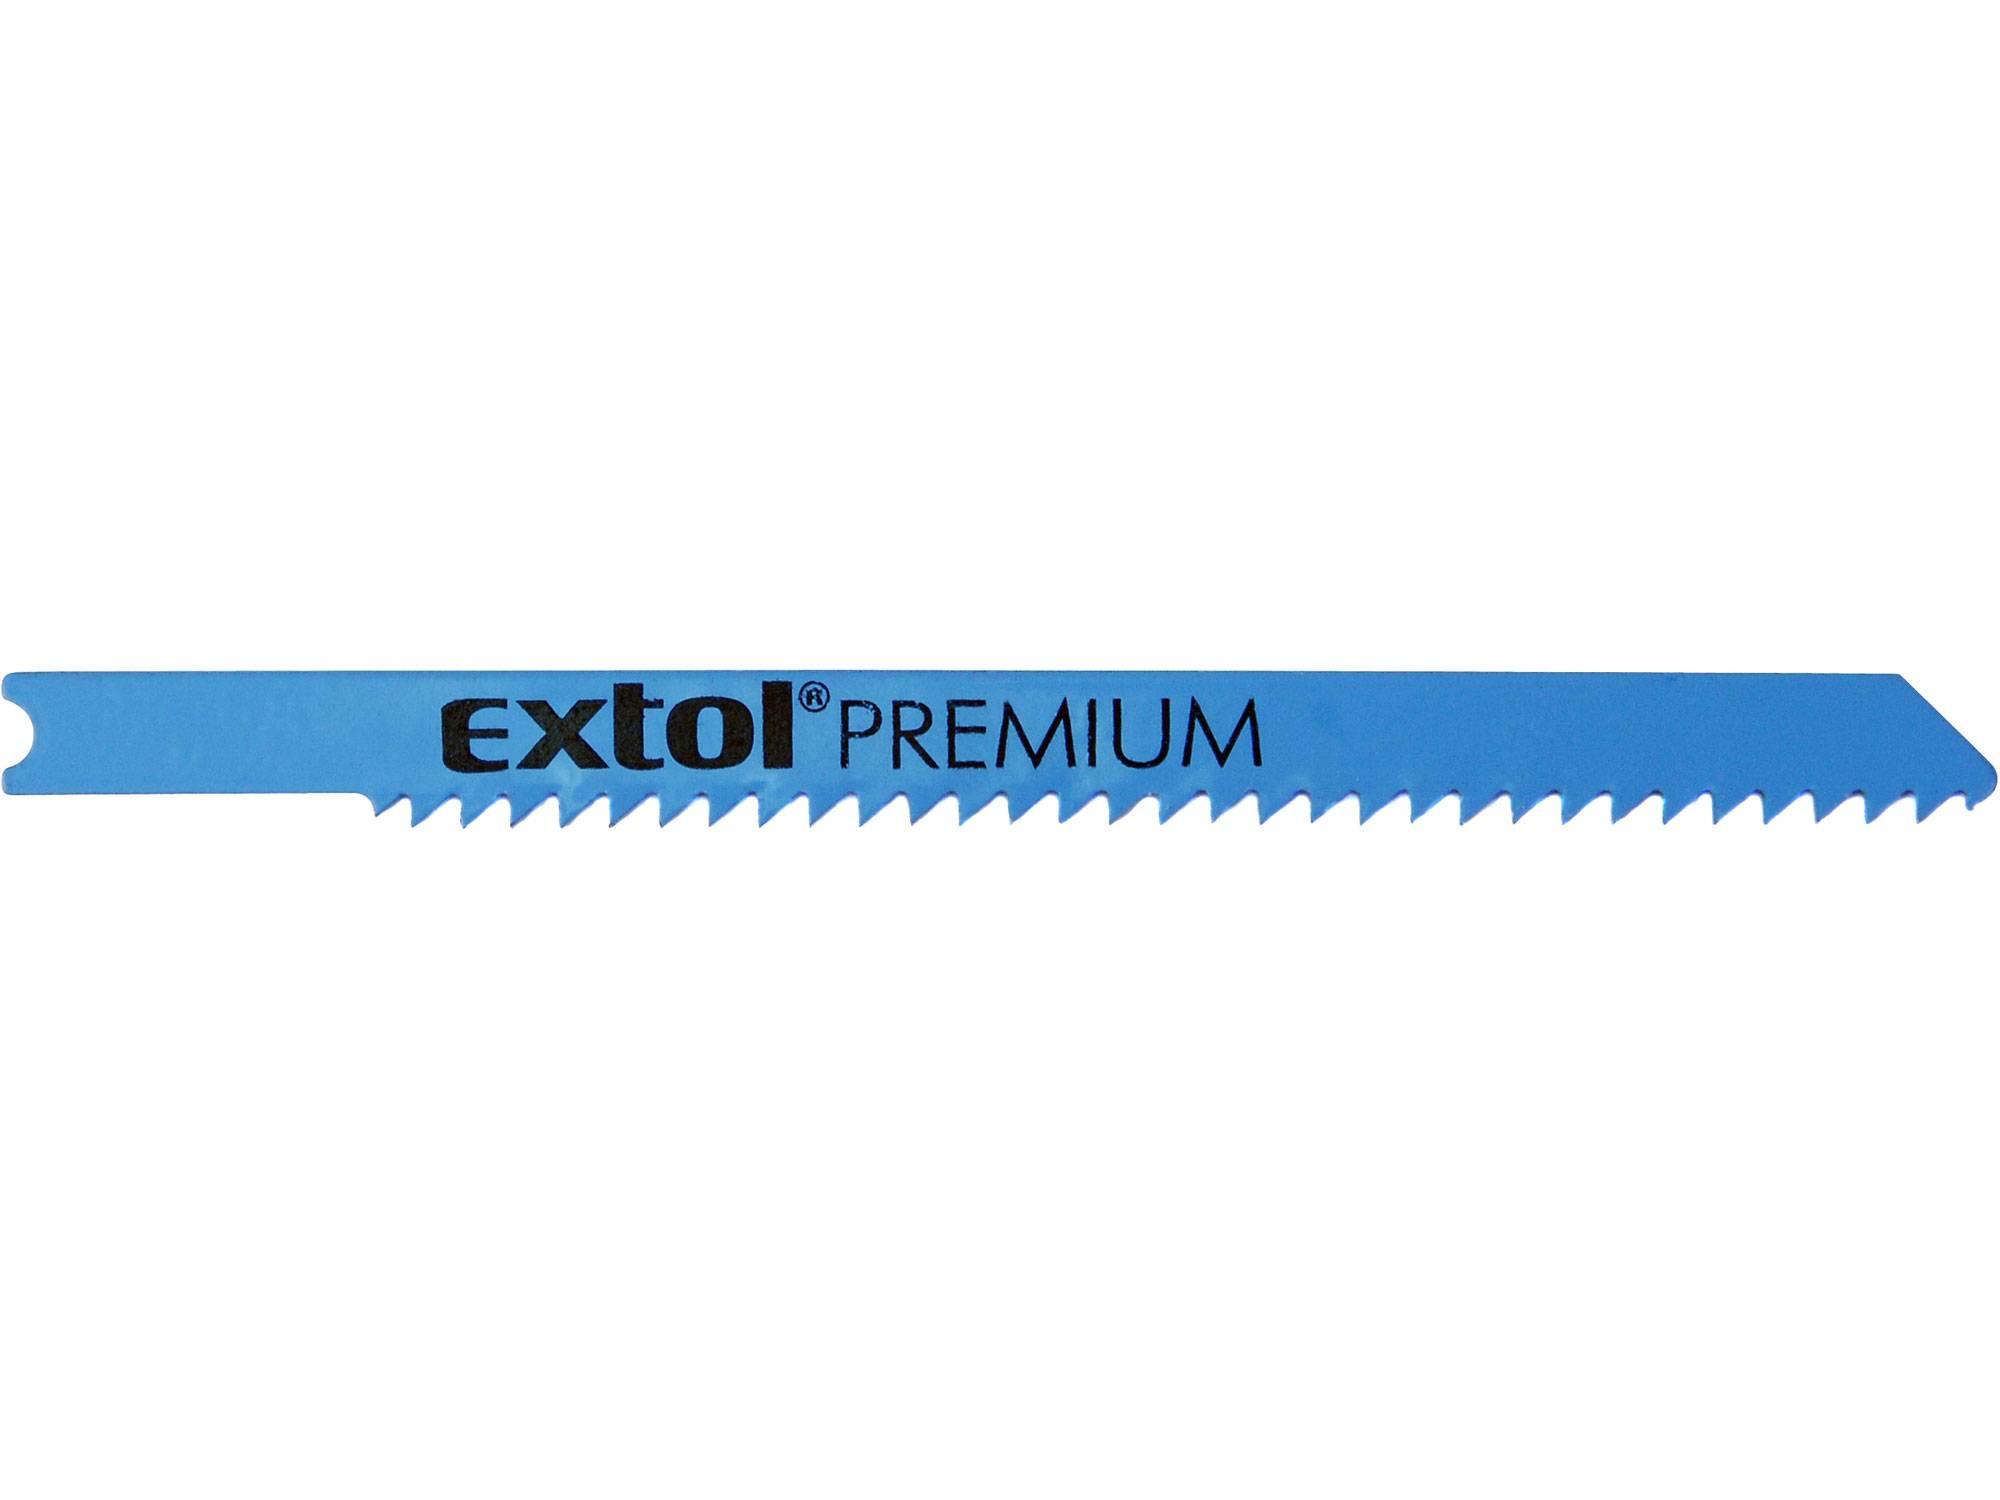 plátky do přímočaré pily 5ks, 75x2,5mm, Bi-metal 8805703 EXTOL PREMIUM